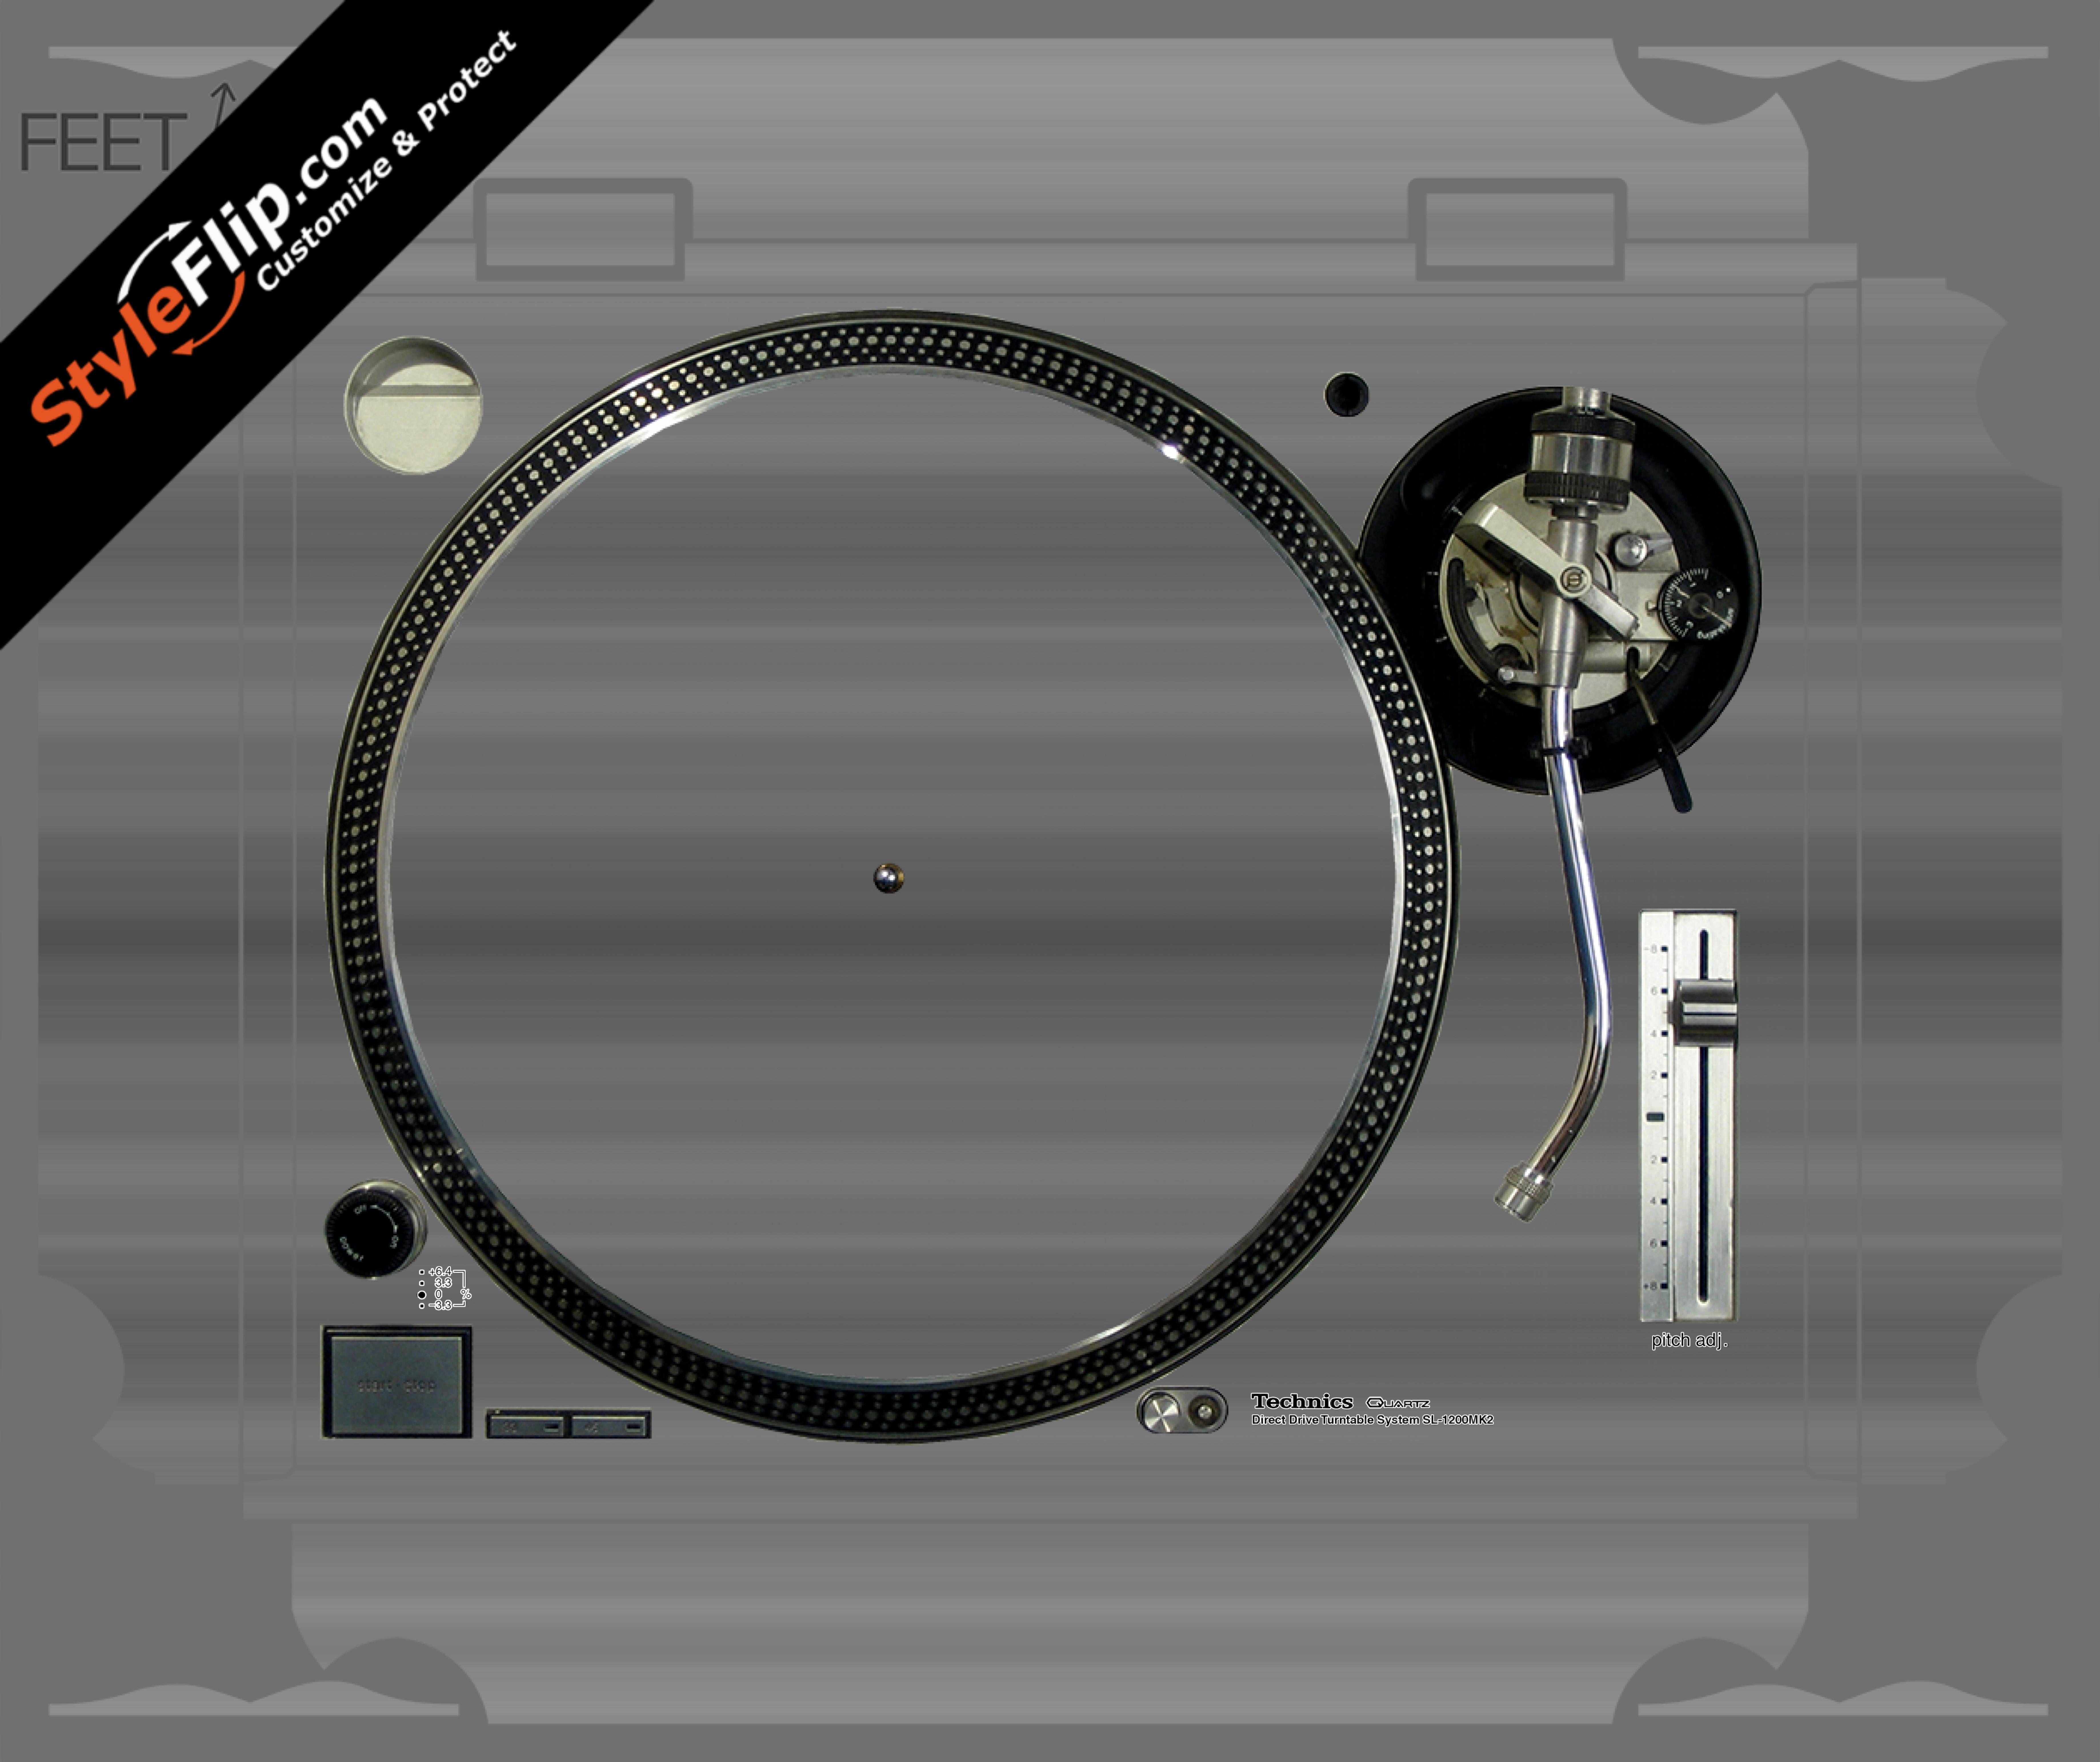 Grays Technics SL-1200 MK2